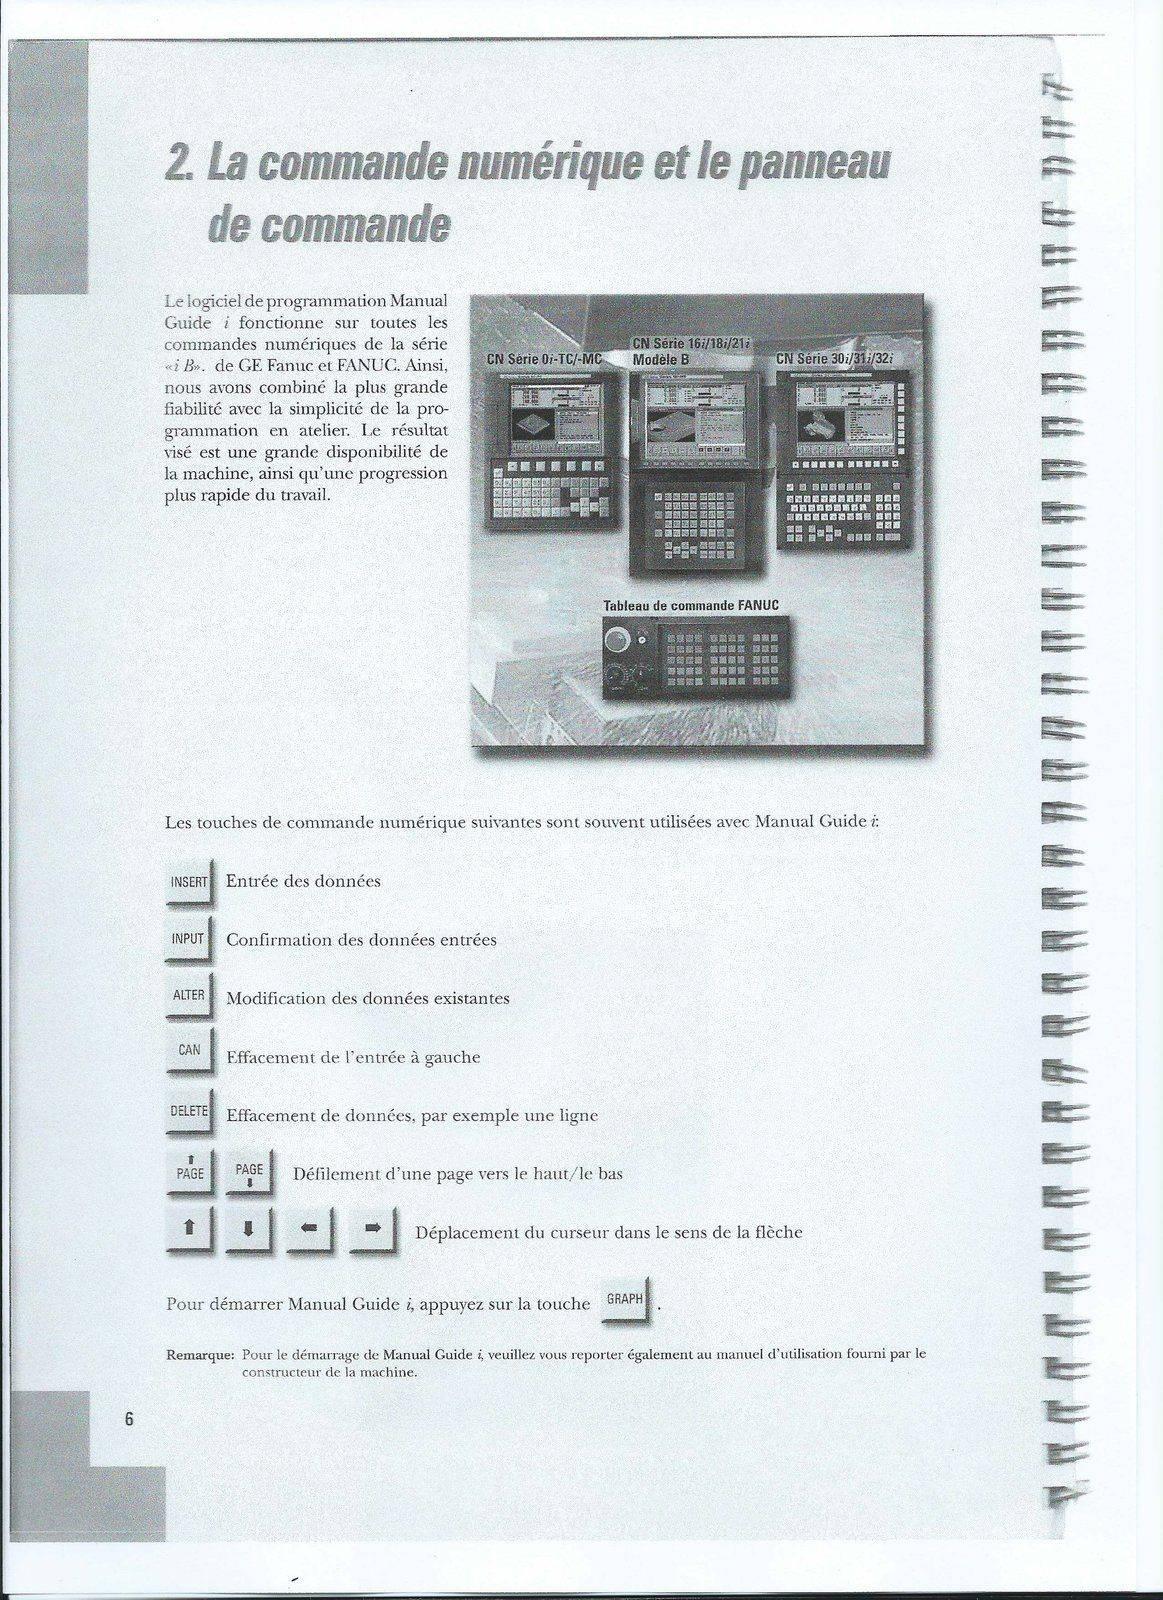 manuel guide 2.jpg